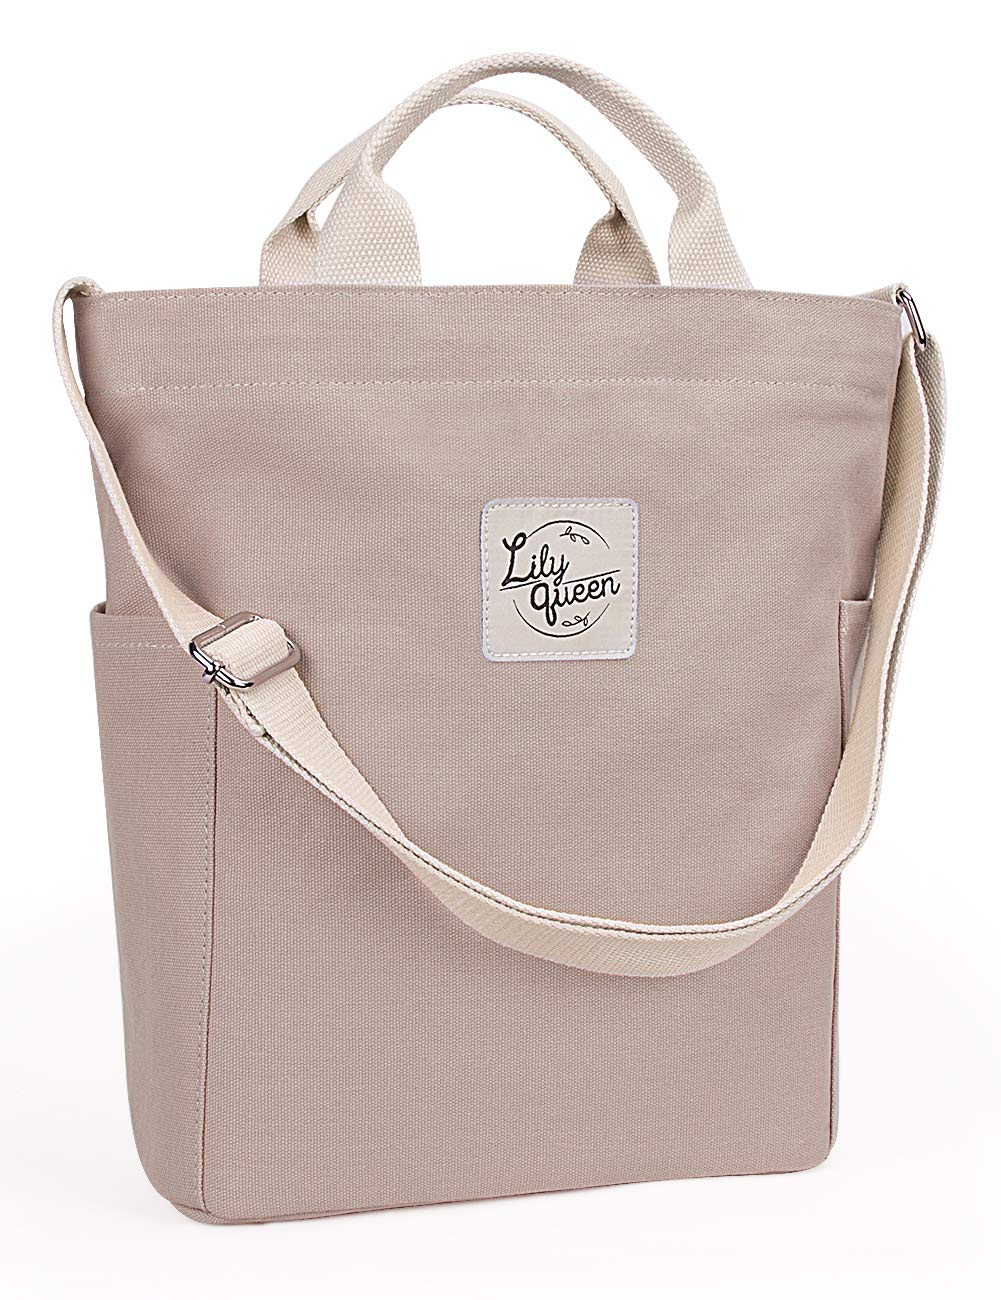 Lily Queen Women Canvas Tote Handbags Casual Shoulder Work Bag Crossbody (Taupe Grey)